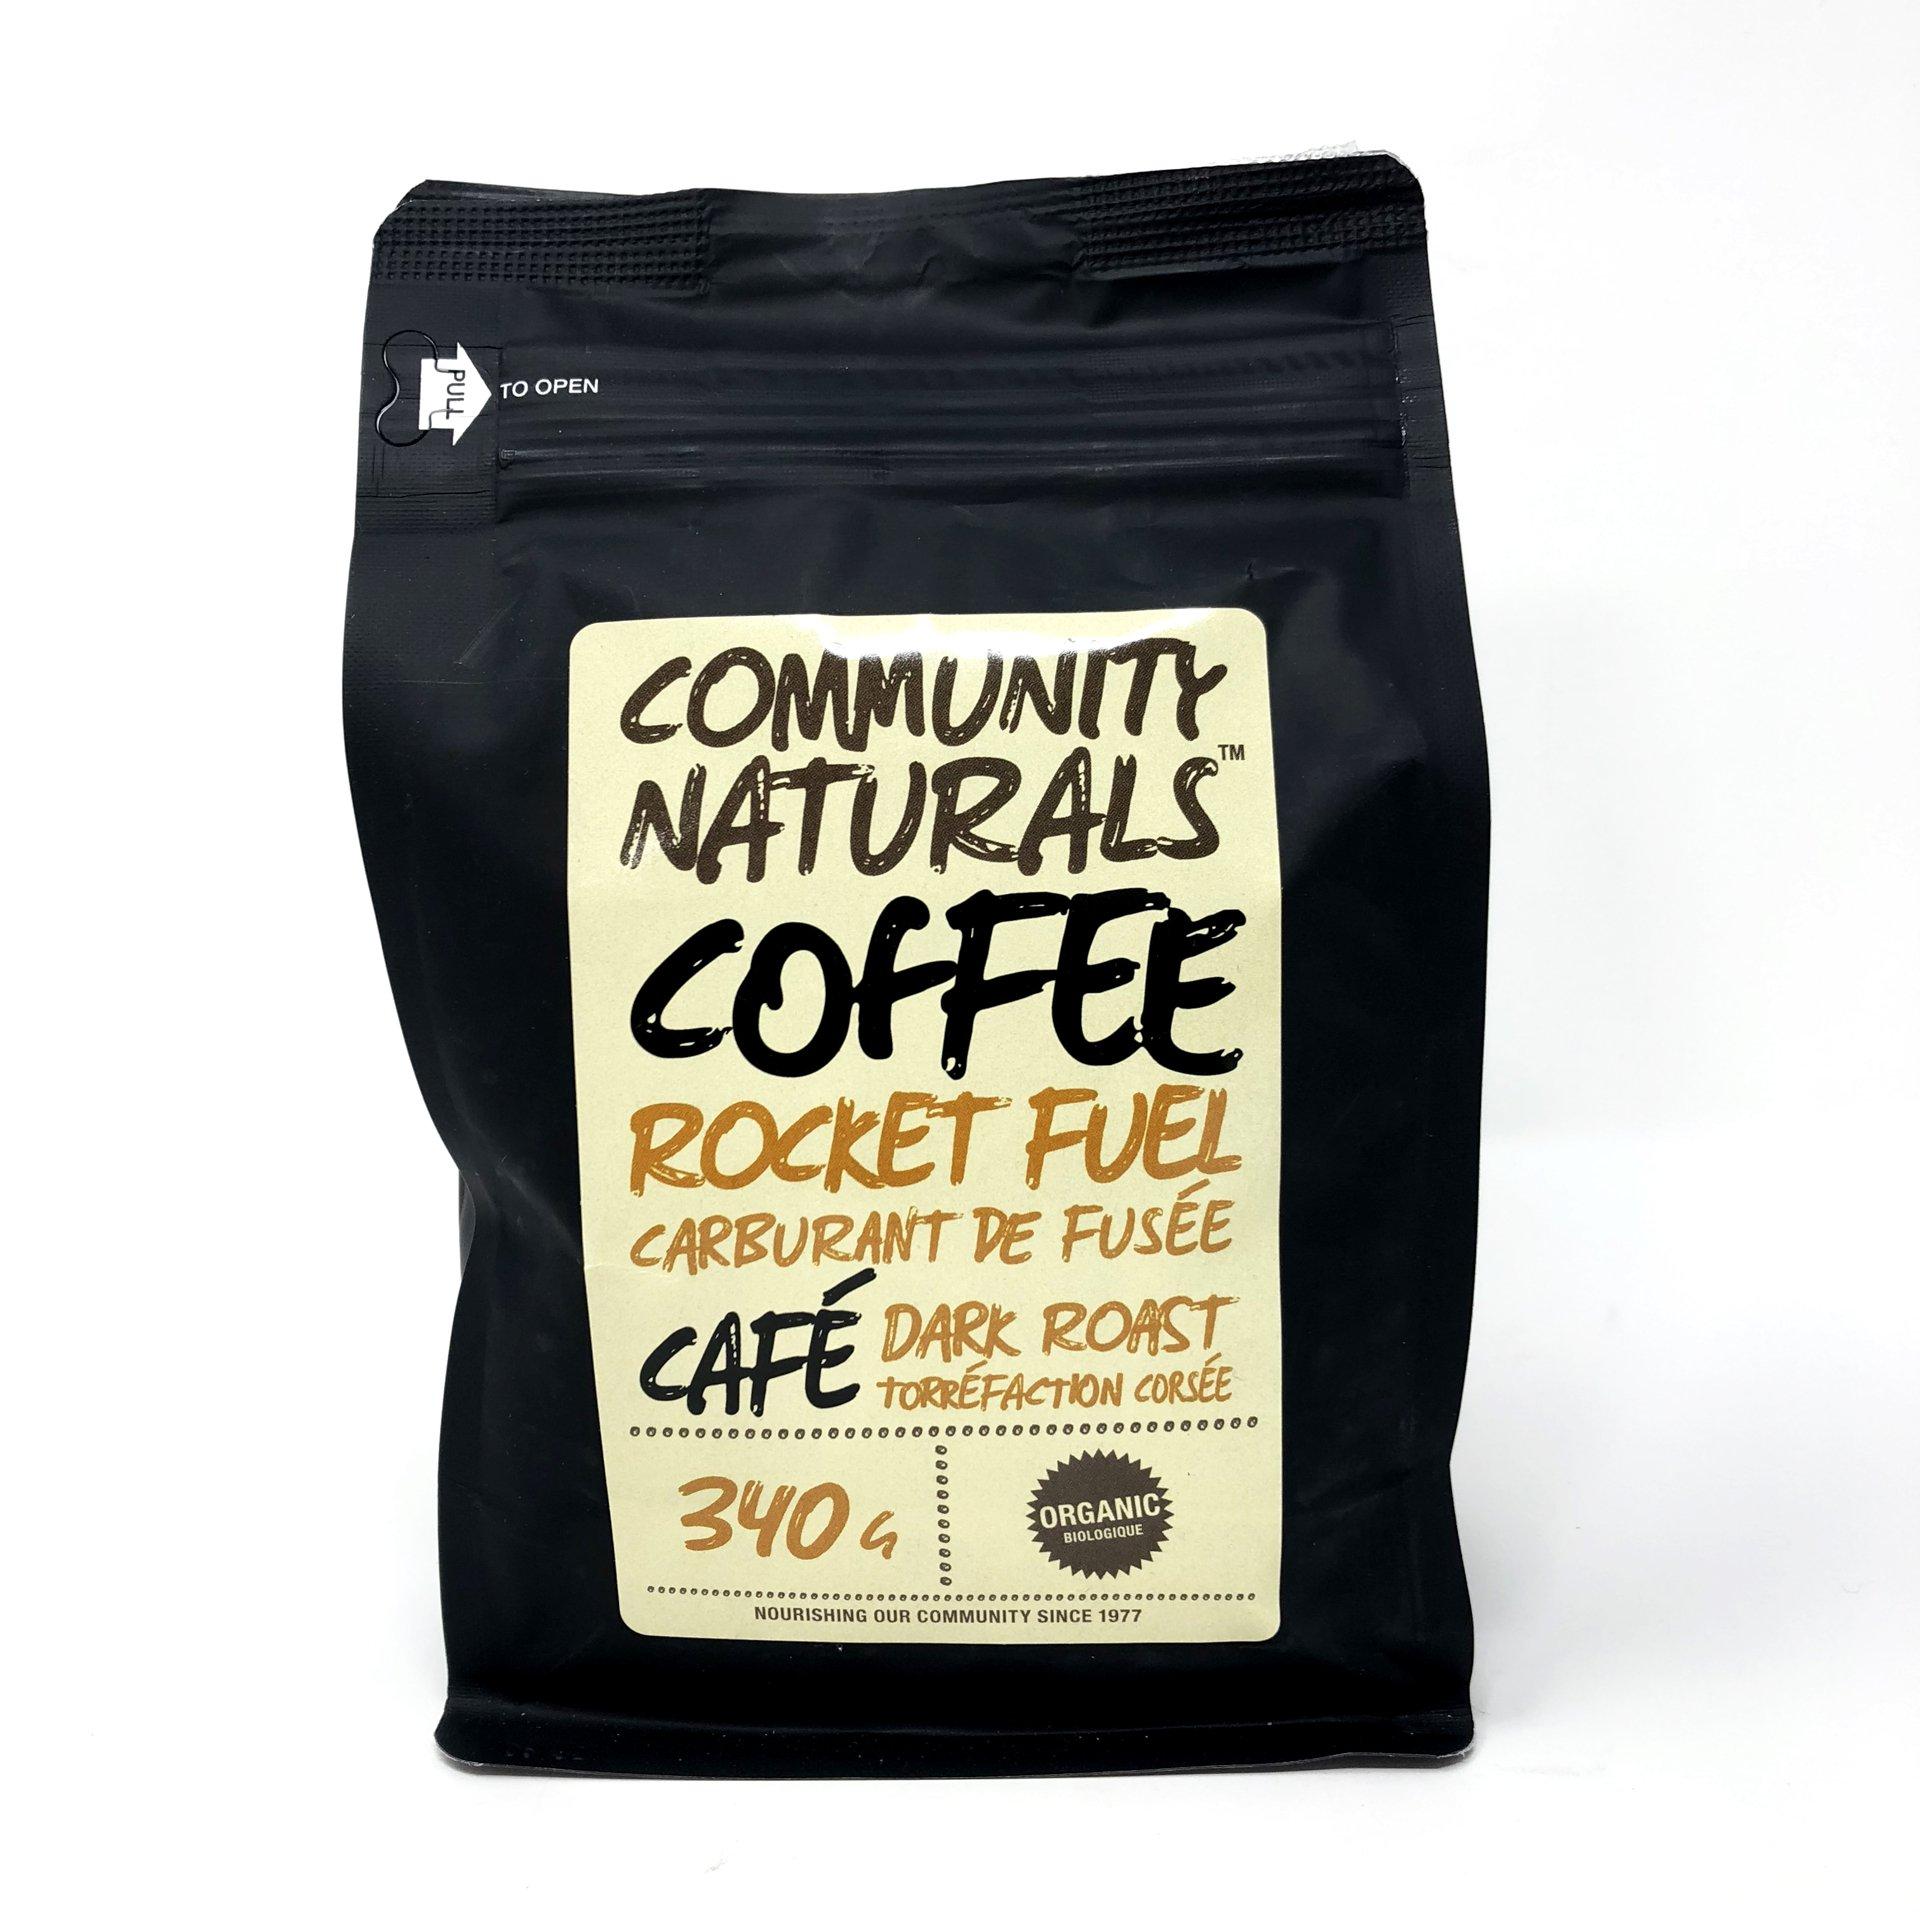 Coffee - Rocket Fuel - 340 g